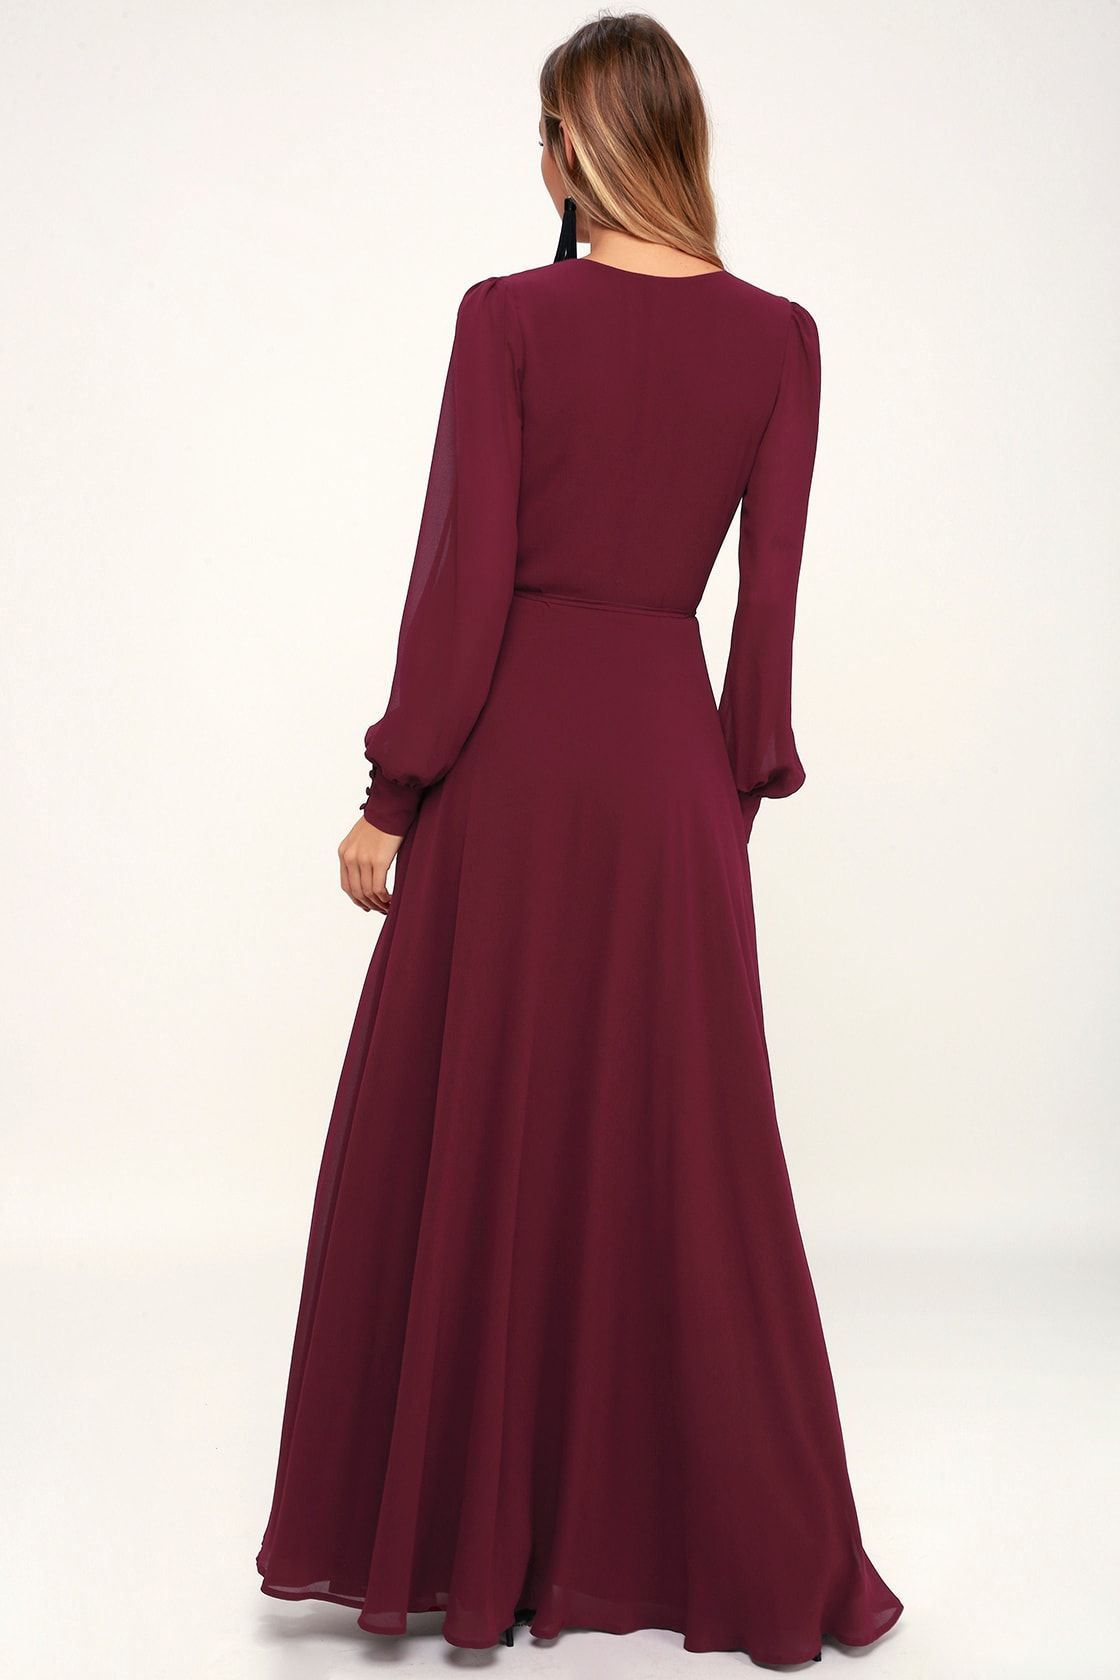 My Whole Heart Burgundy Long Sleeve Wrap Dress Long Sleeve Bridesmaid Dress Long Sleeve Wrap Dress Wrap Dress Long Sleeve [ 1680 x 1120 Pixel ]